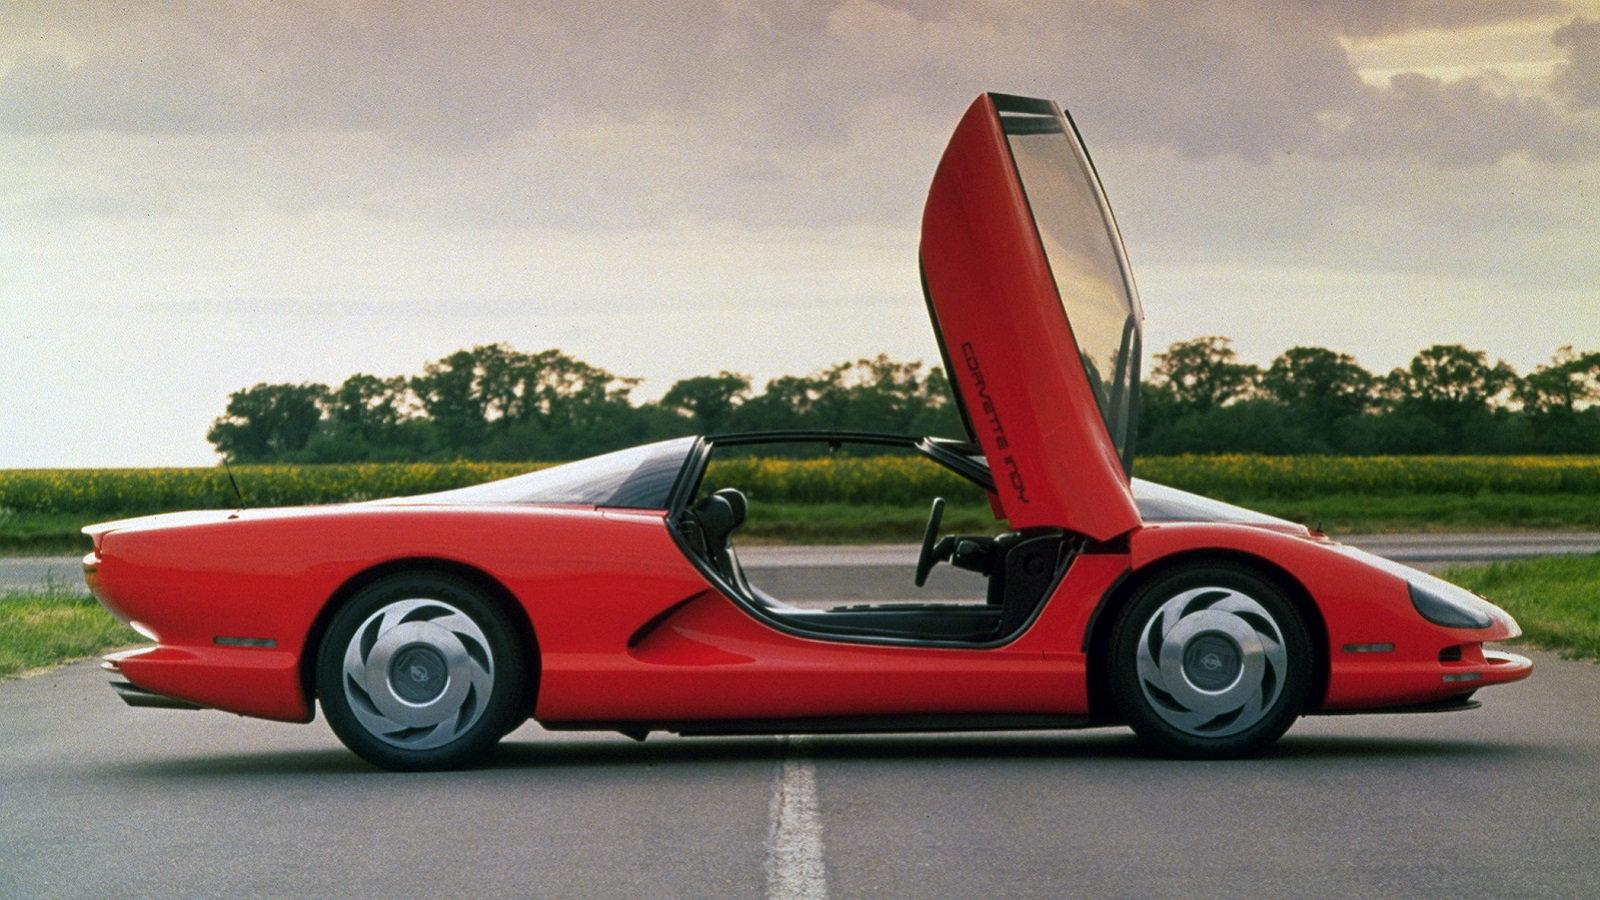 1986 Corvette Indy